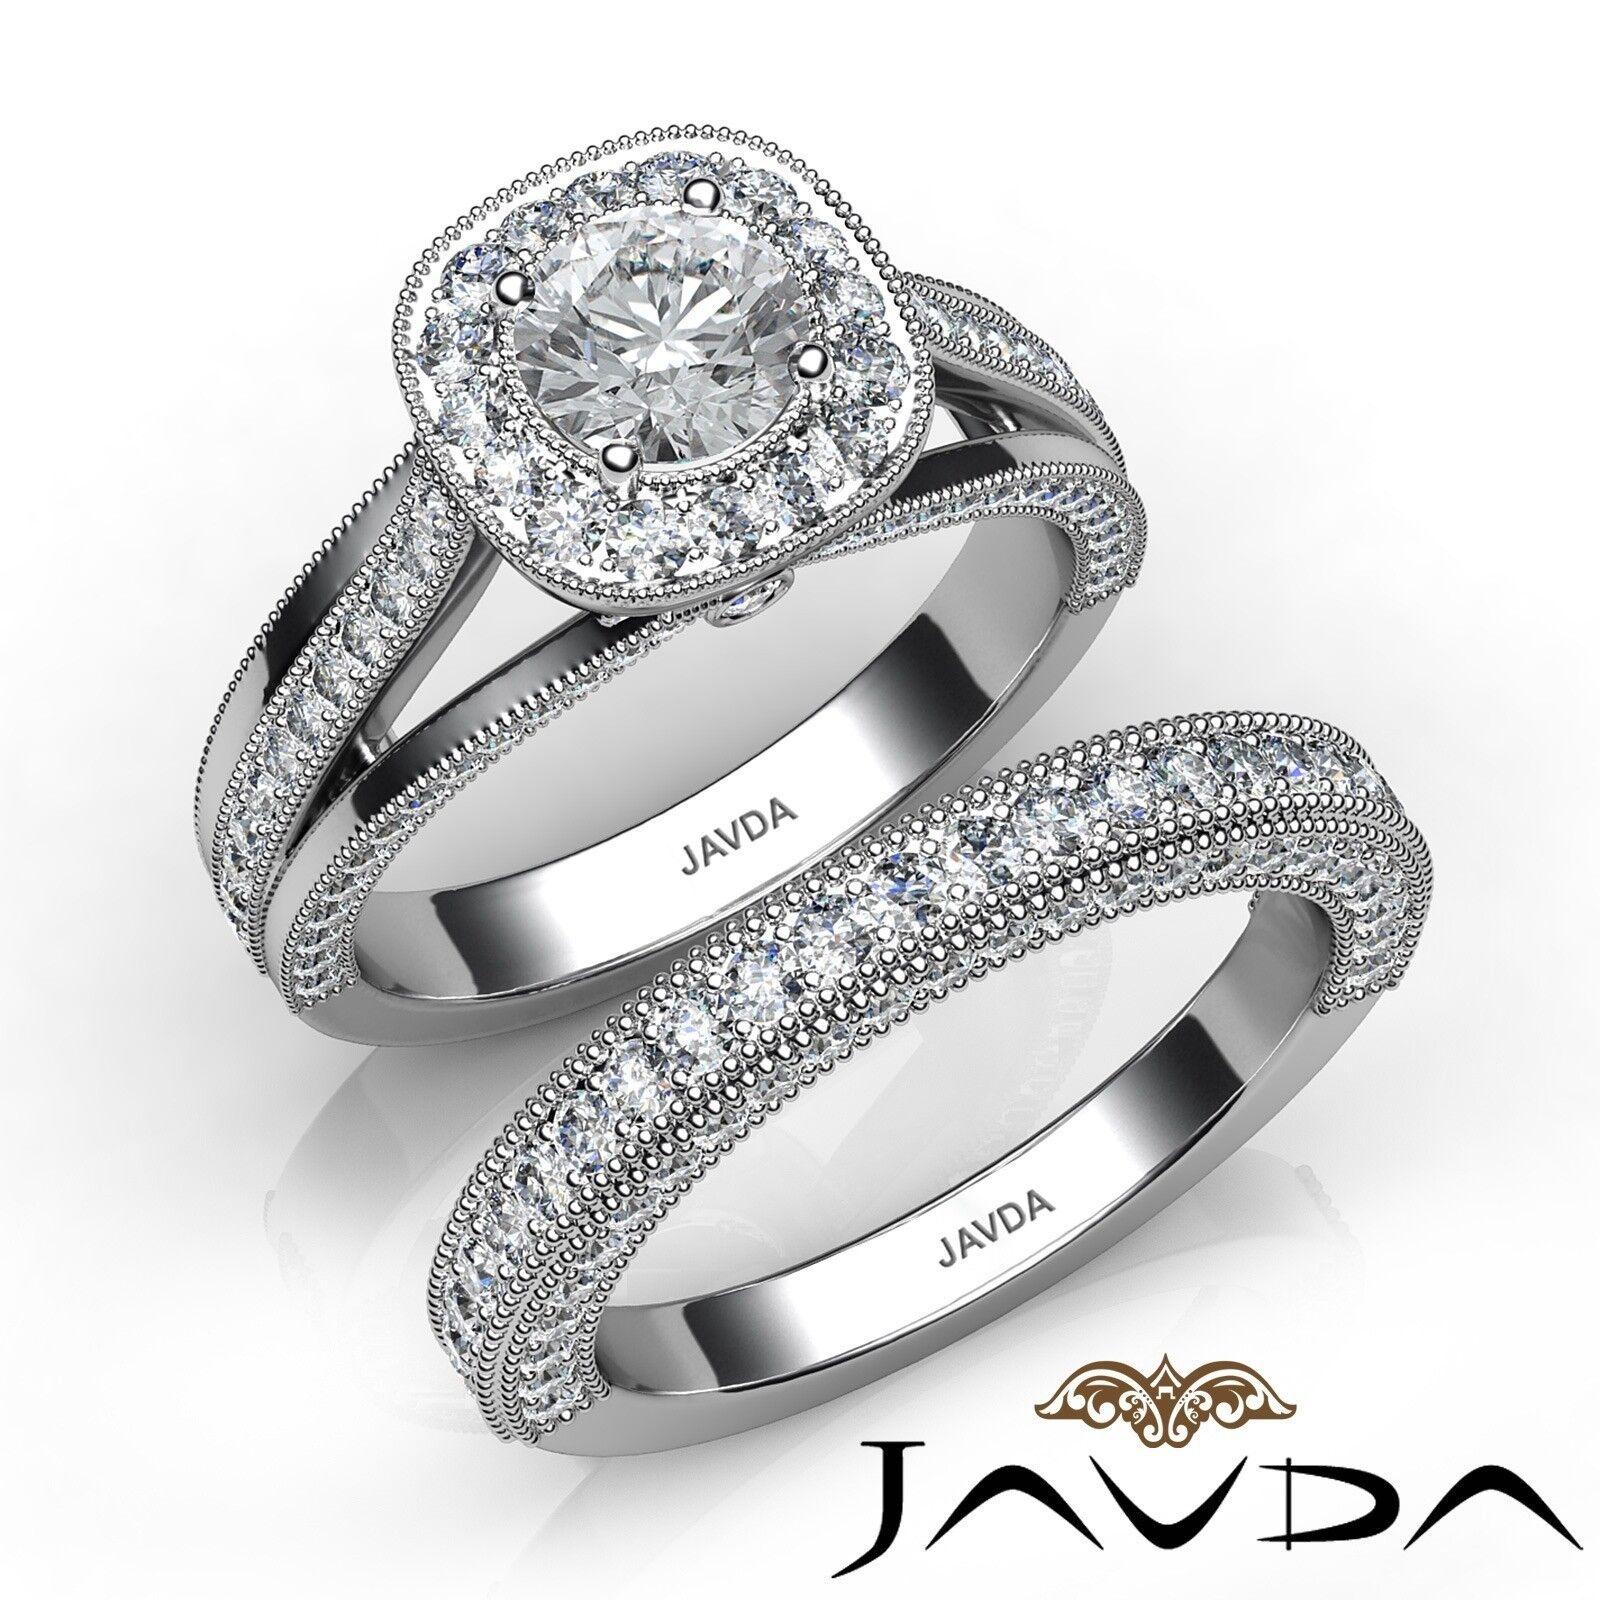 2.36ctw Milgrain Bridal Set Halo Round Diamond Engagement Ring GIA H-VVS1 W Gold